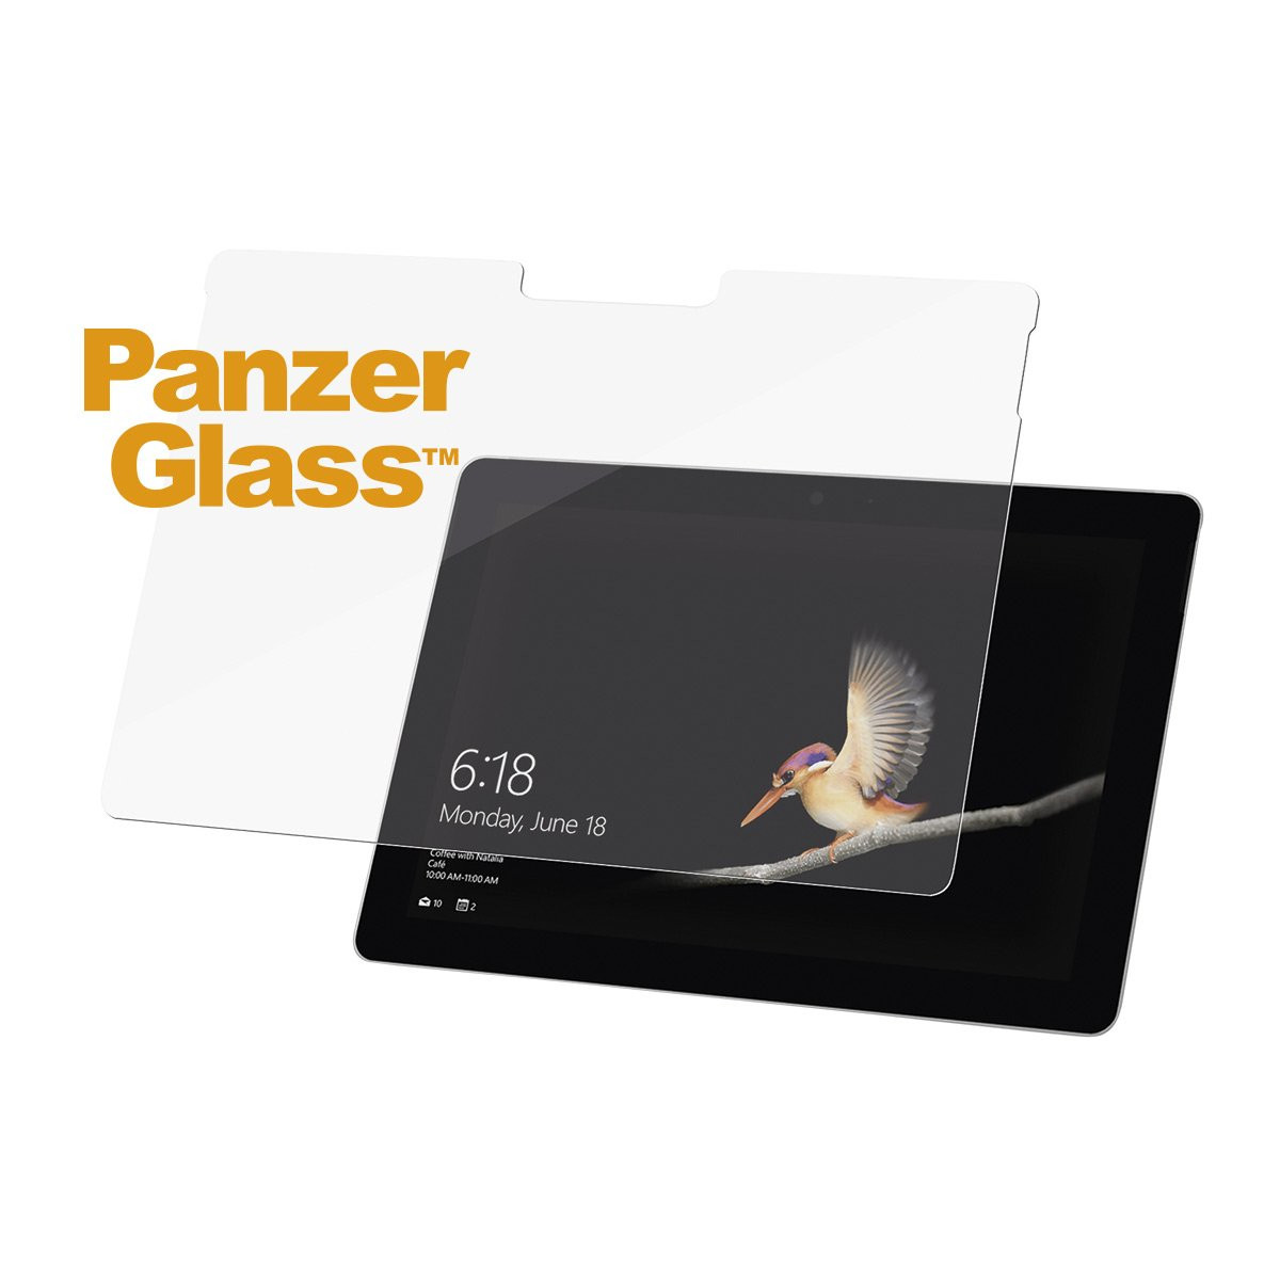 PanzerGlass 6255 Displayschutzfolie, Microsoft Surface Go, Kratzfest, stoßfest, transparent, 1 Stück